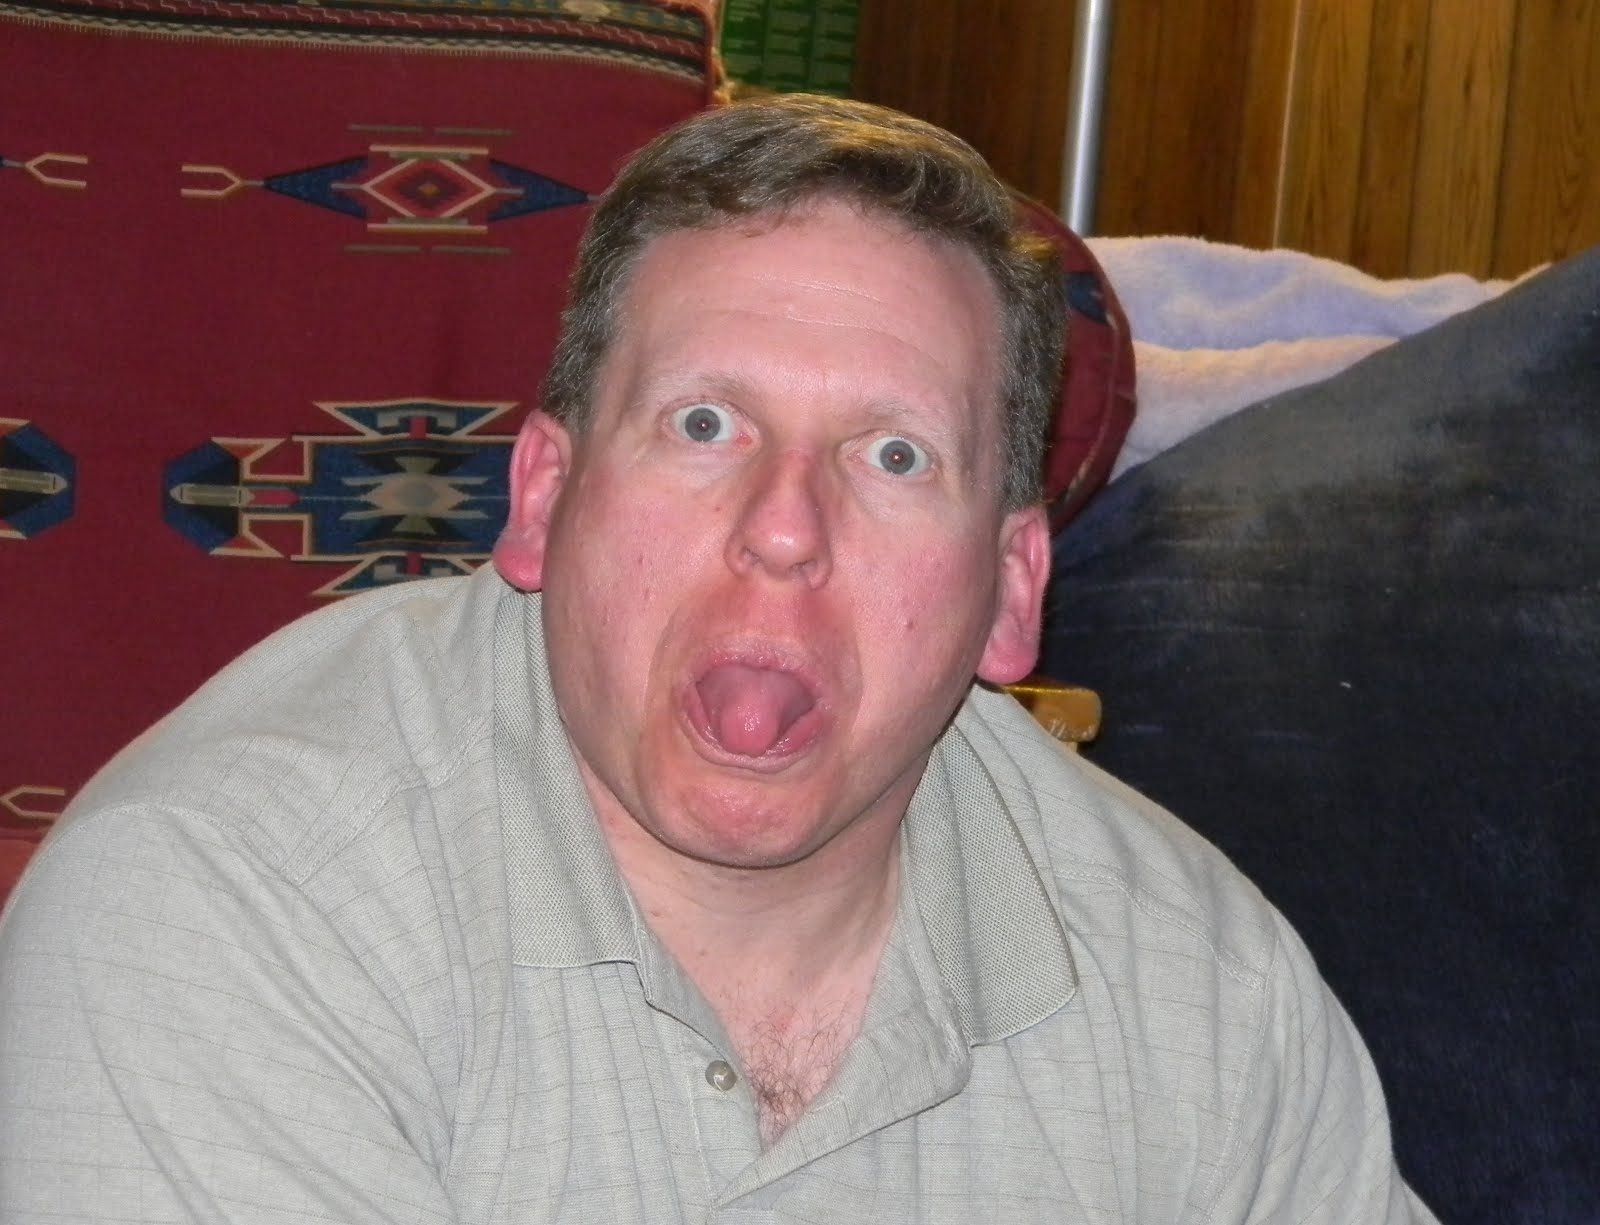 http://3.bp.blogspot.com/_ly6GDM27qm8/TU8TbDoh0XI/AAAAAAAAAvE/kuf_ANiV5es/s1600/scott-tongue.jpg